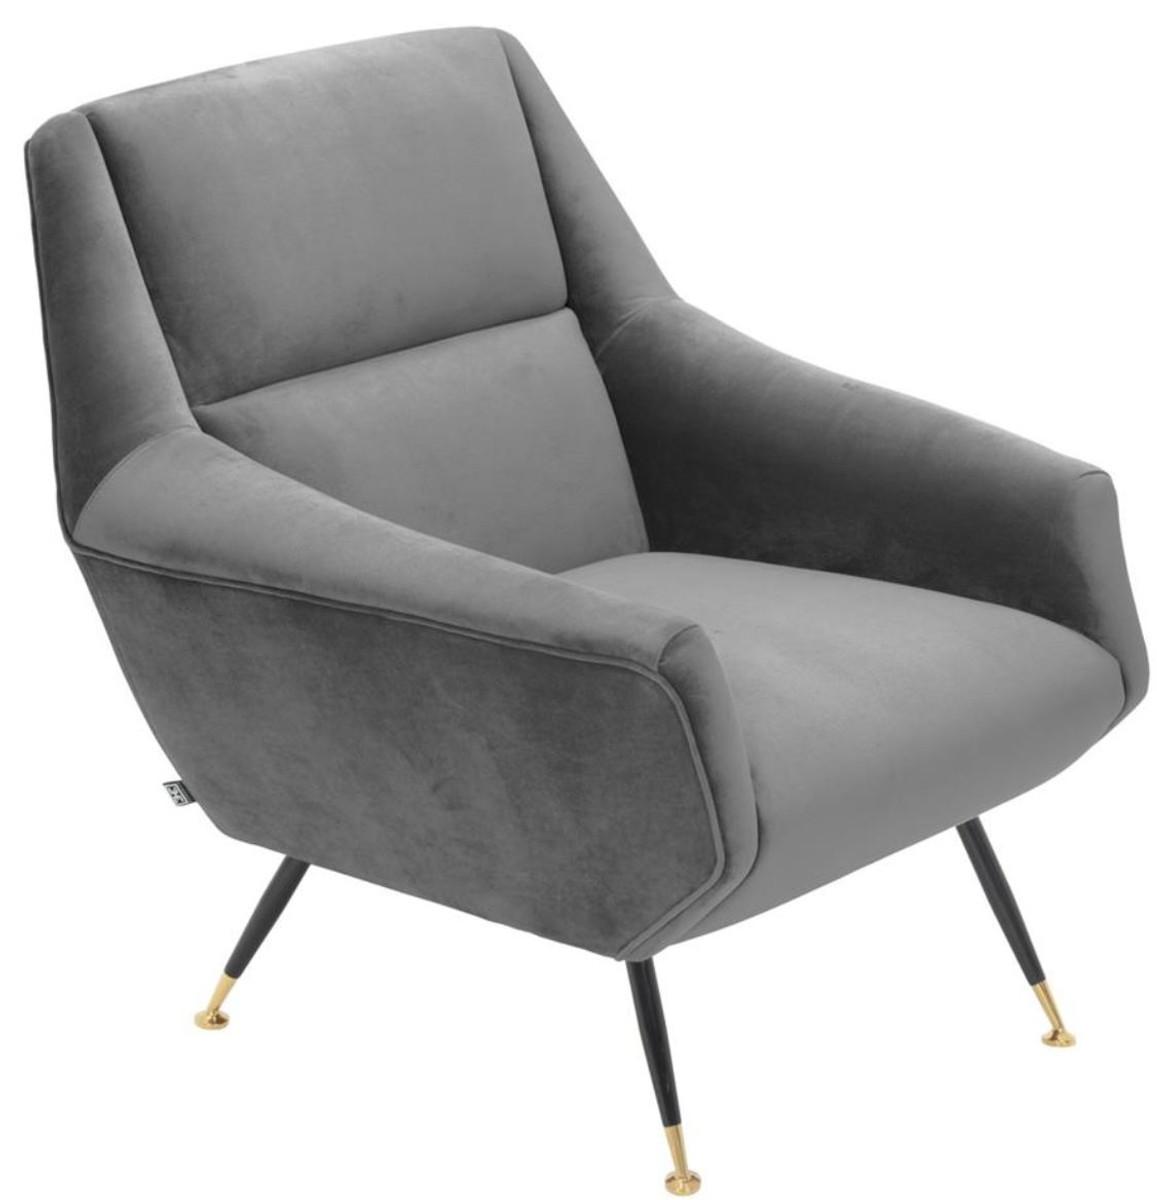 Casa Padrino Luxus Salon Sessel Grau / Schwarz / Messing 75 x 75 x H. 78 cm - Hotel Möbel 5